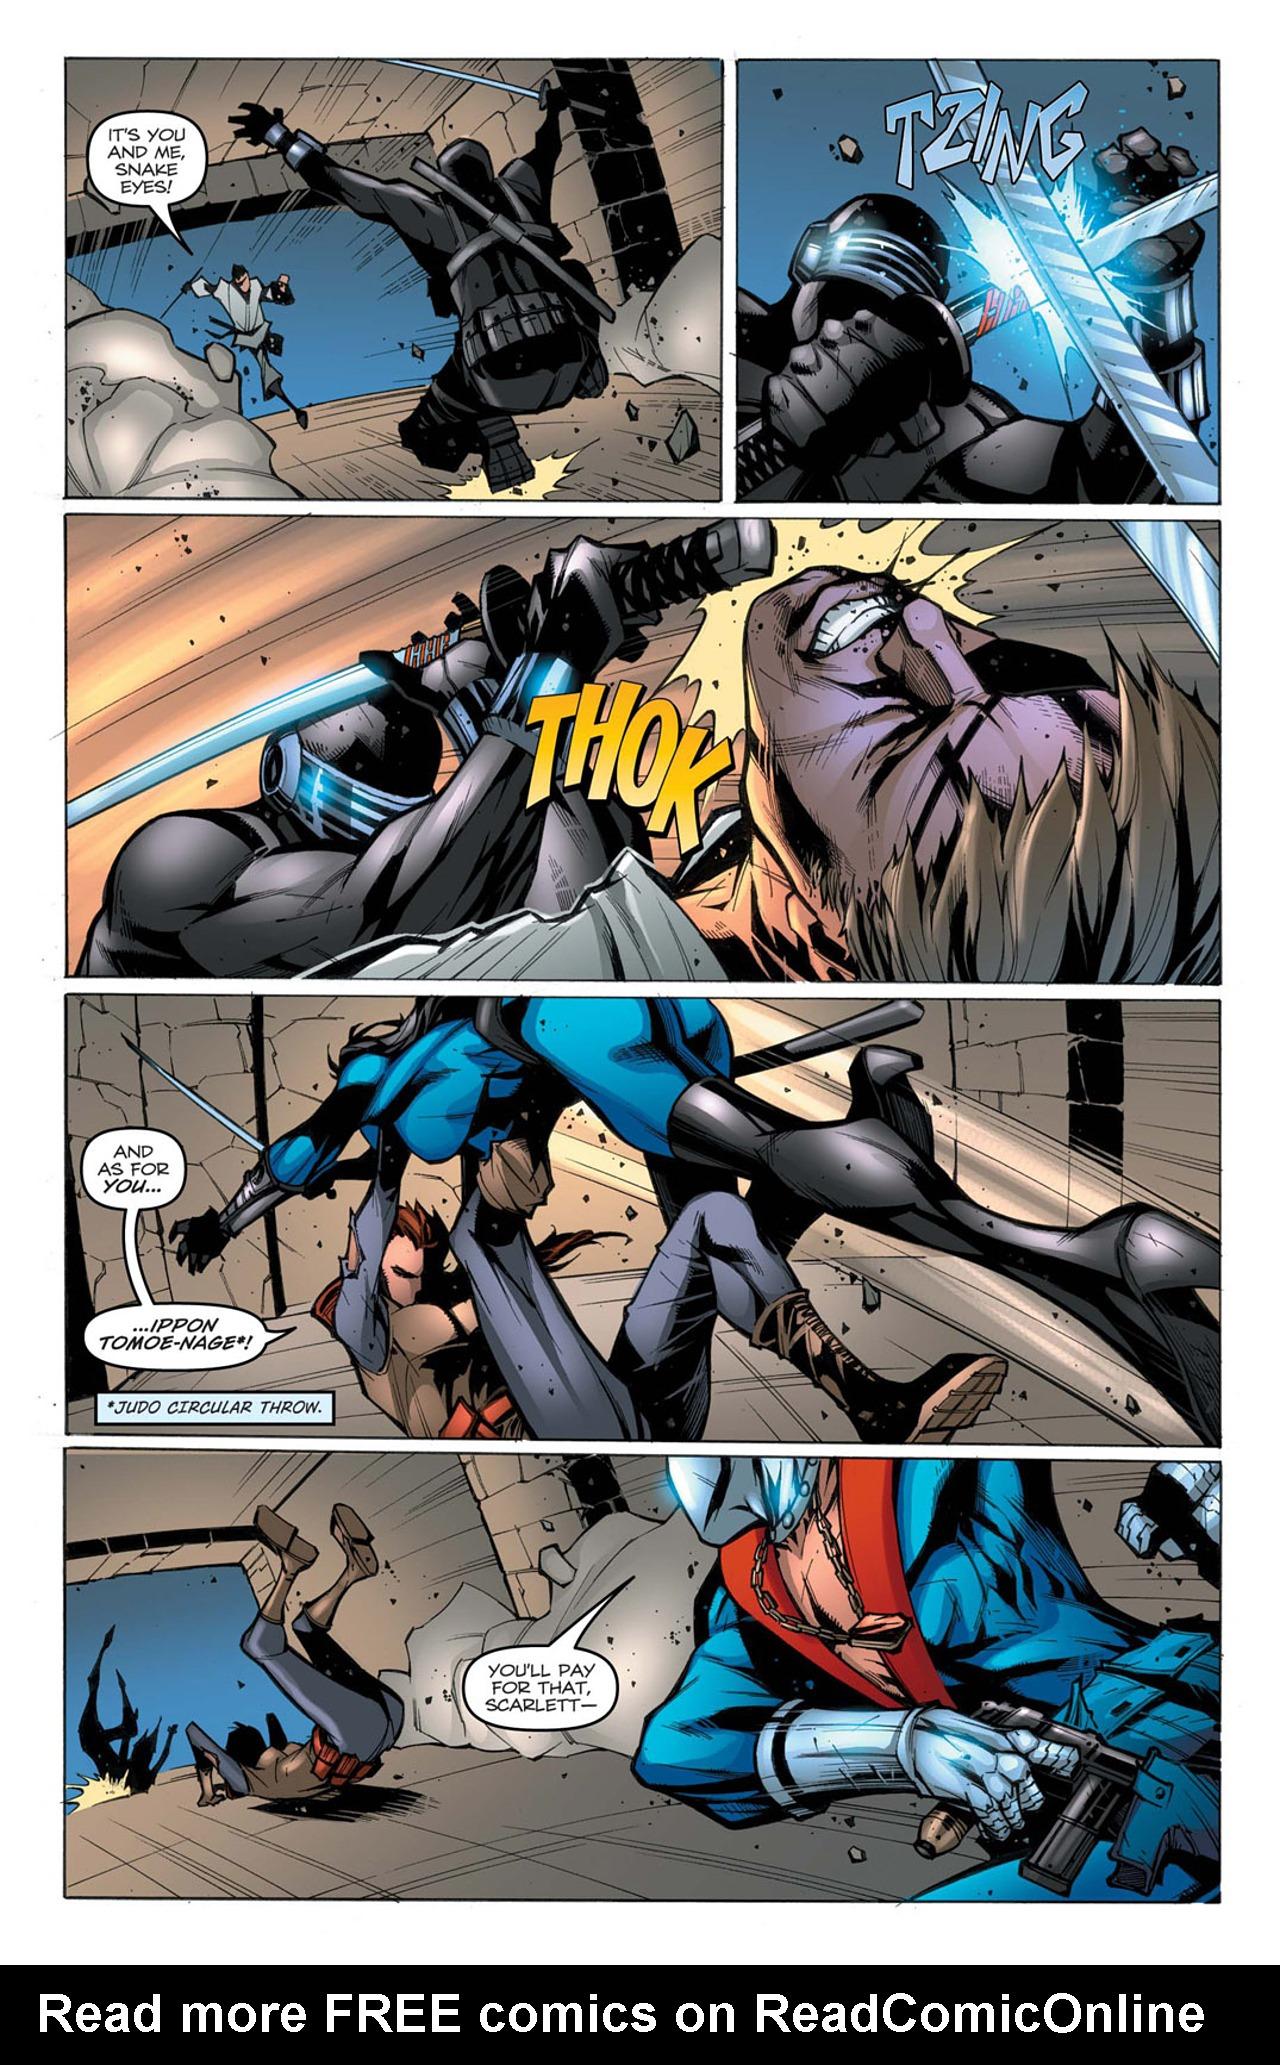 G.I. Joe: A Real American Hero 159 Page 10